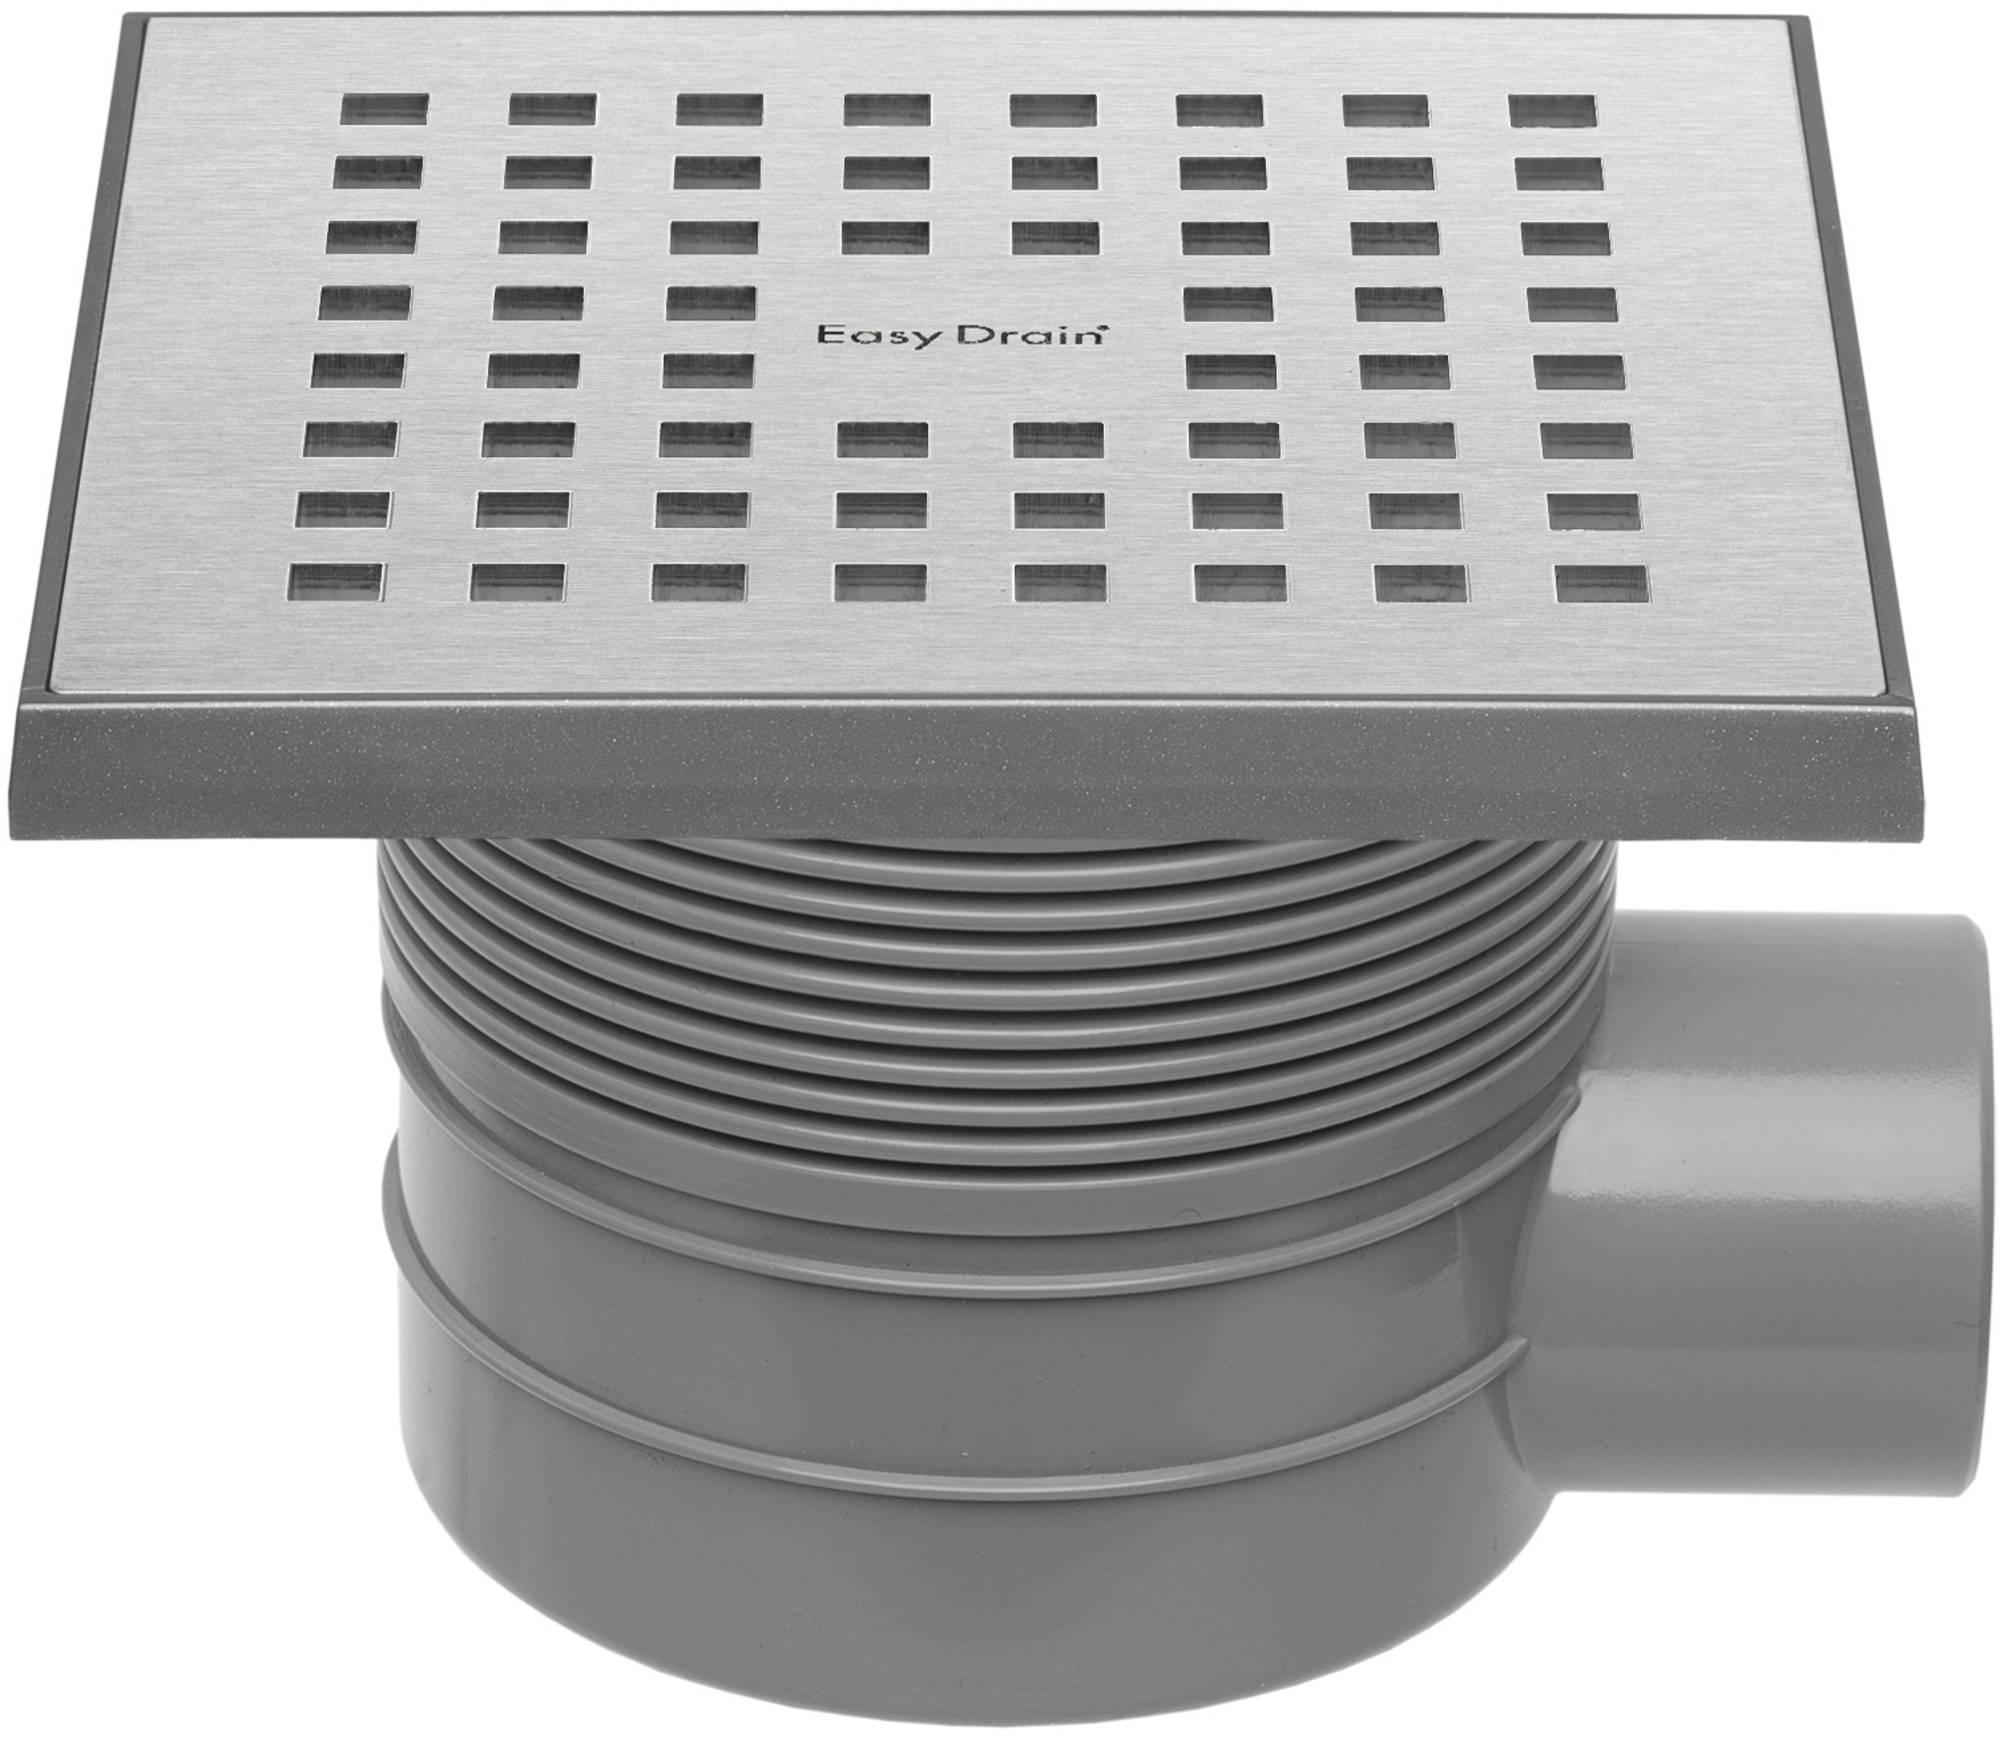 Easy Drain Aqua Quattro vloerput abs 15 x 15 cm. horizontaal